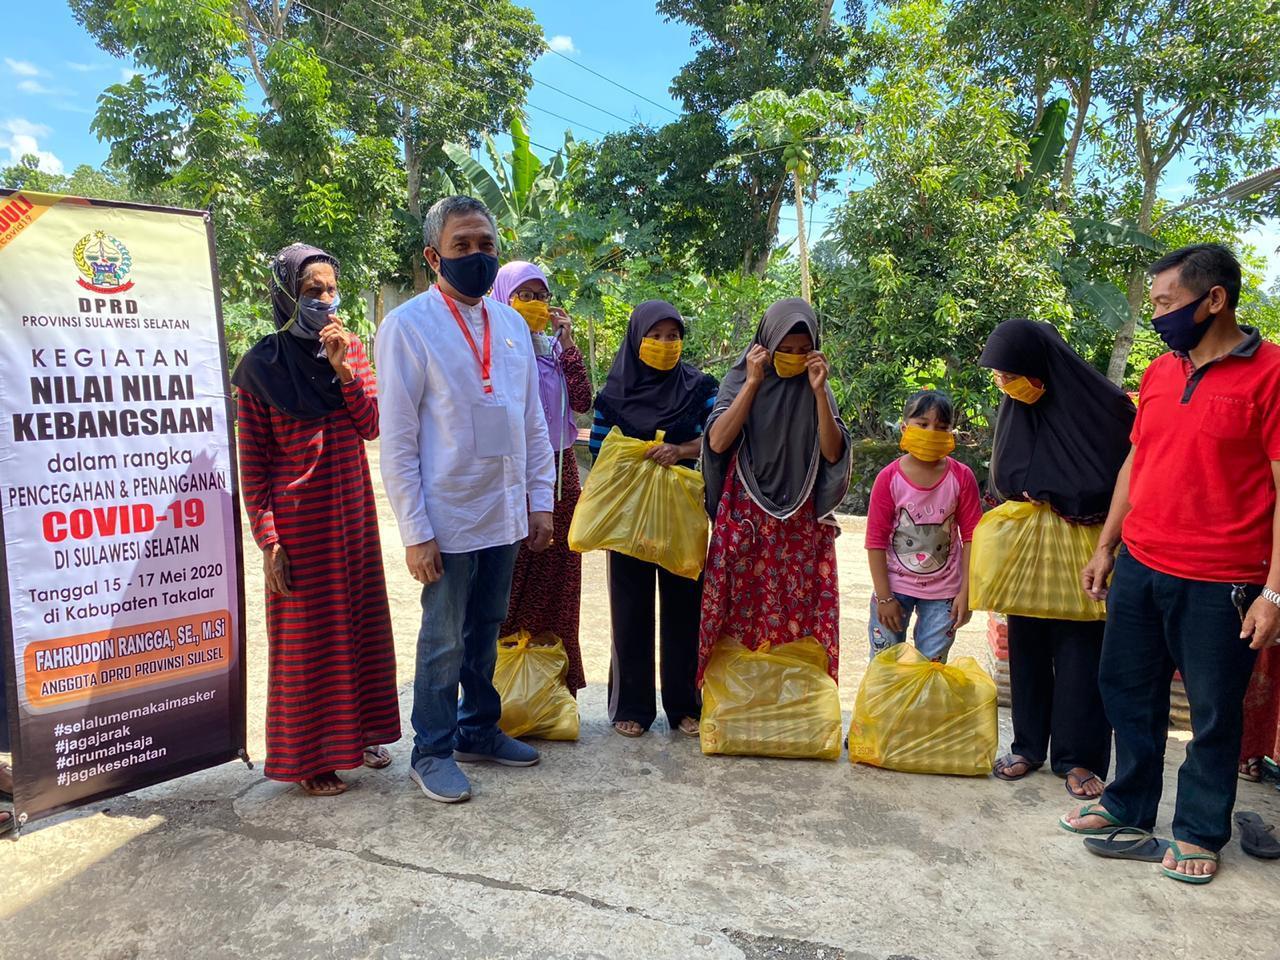 Fachruddin Rangga Salurkan Bantuan Untuk Warga Polut, Polsel dan Pattalassang